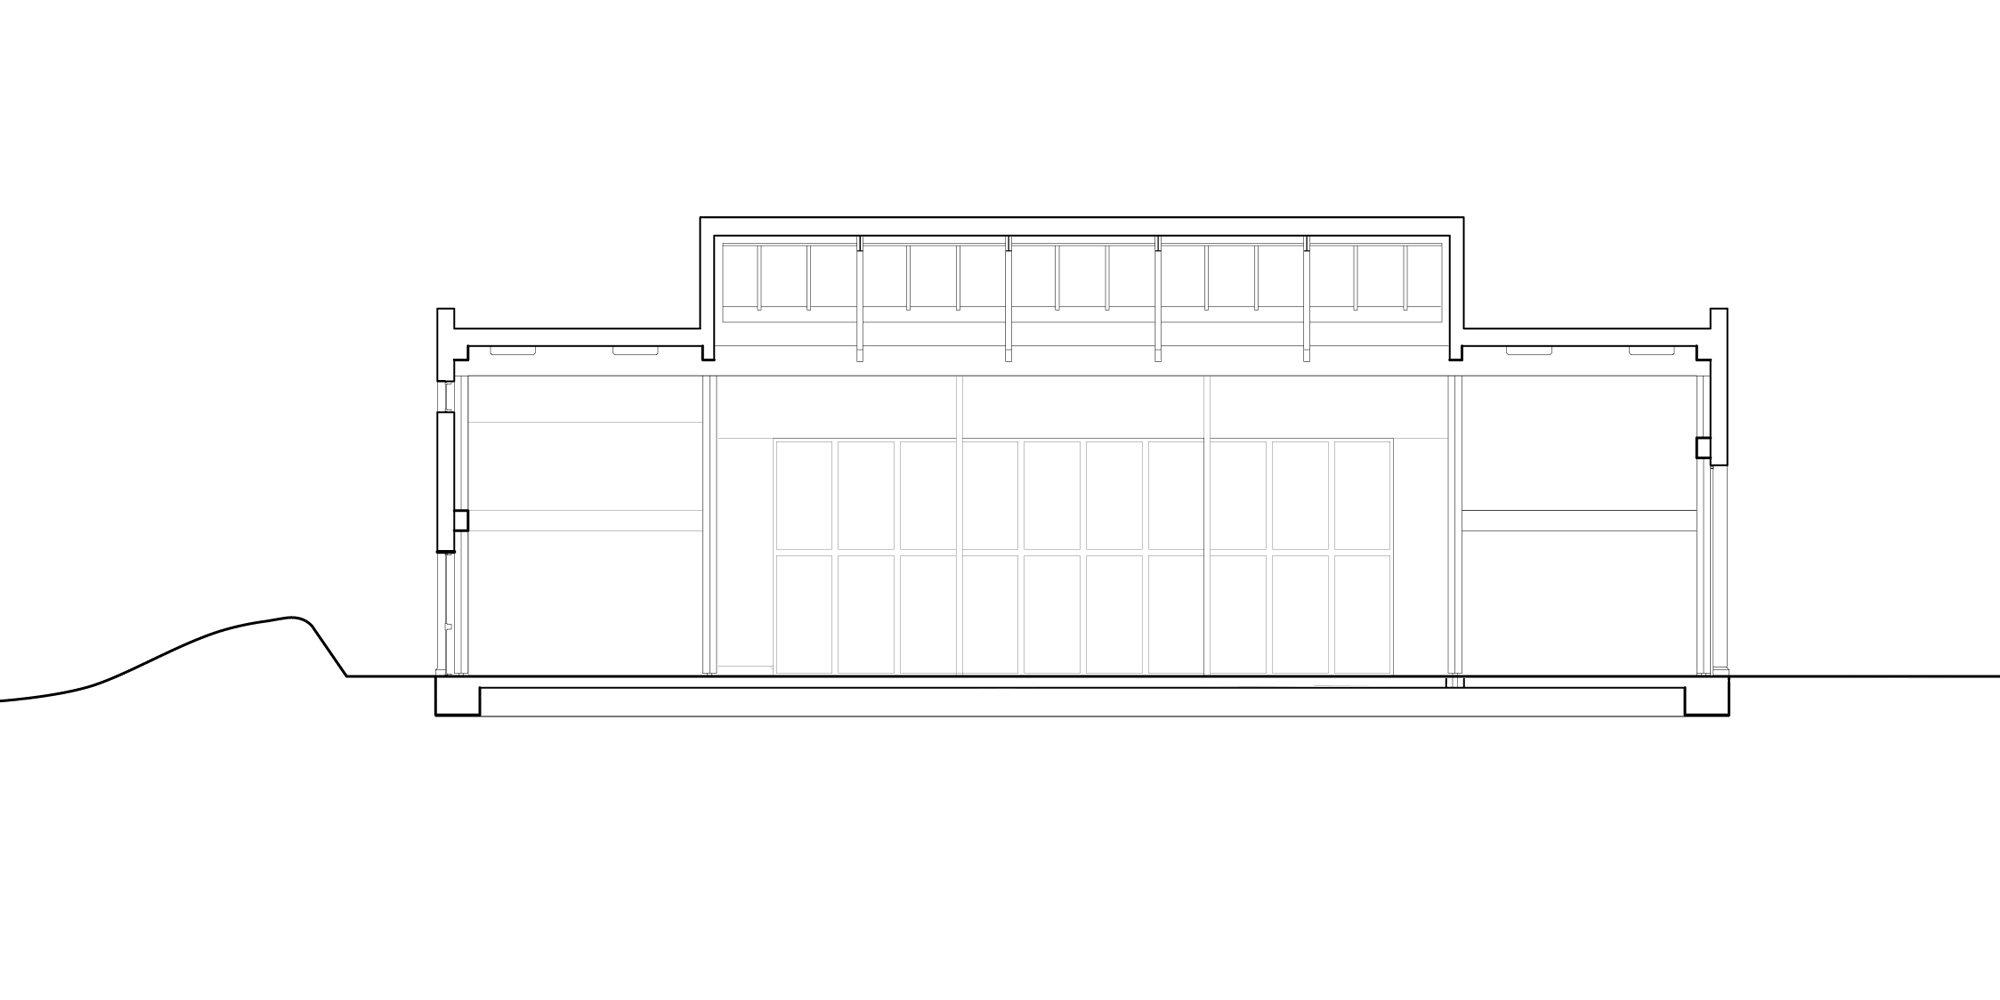 Waugh Thistleton Architects | Vitsœ | Martin Francis |